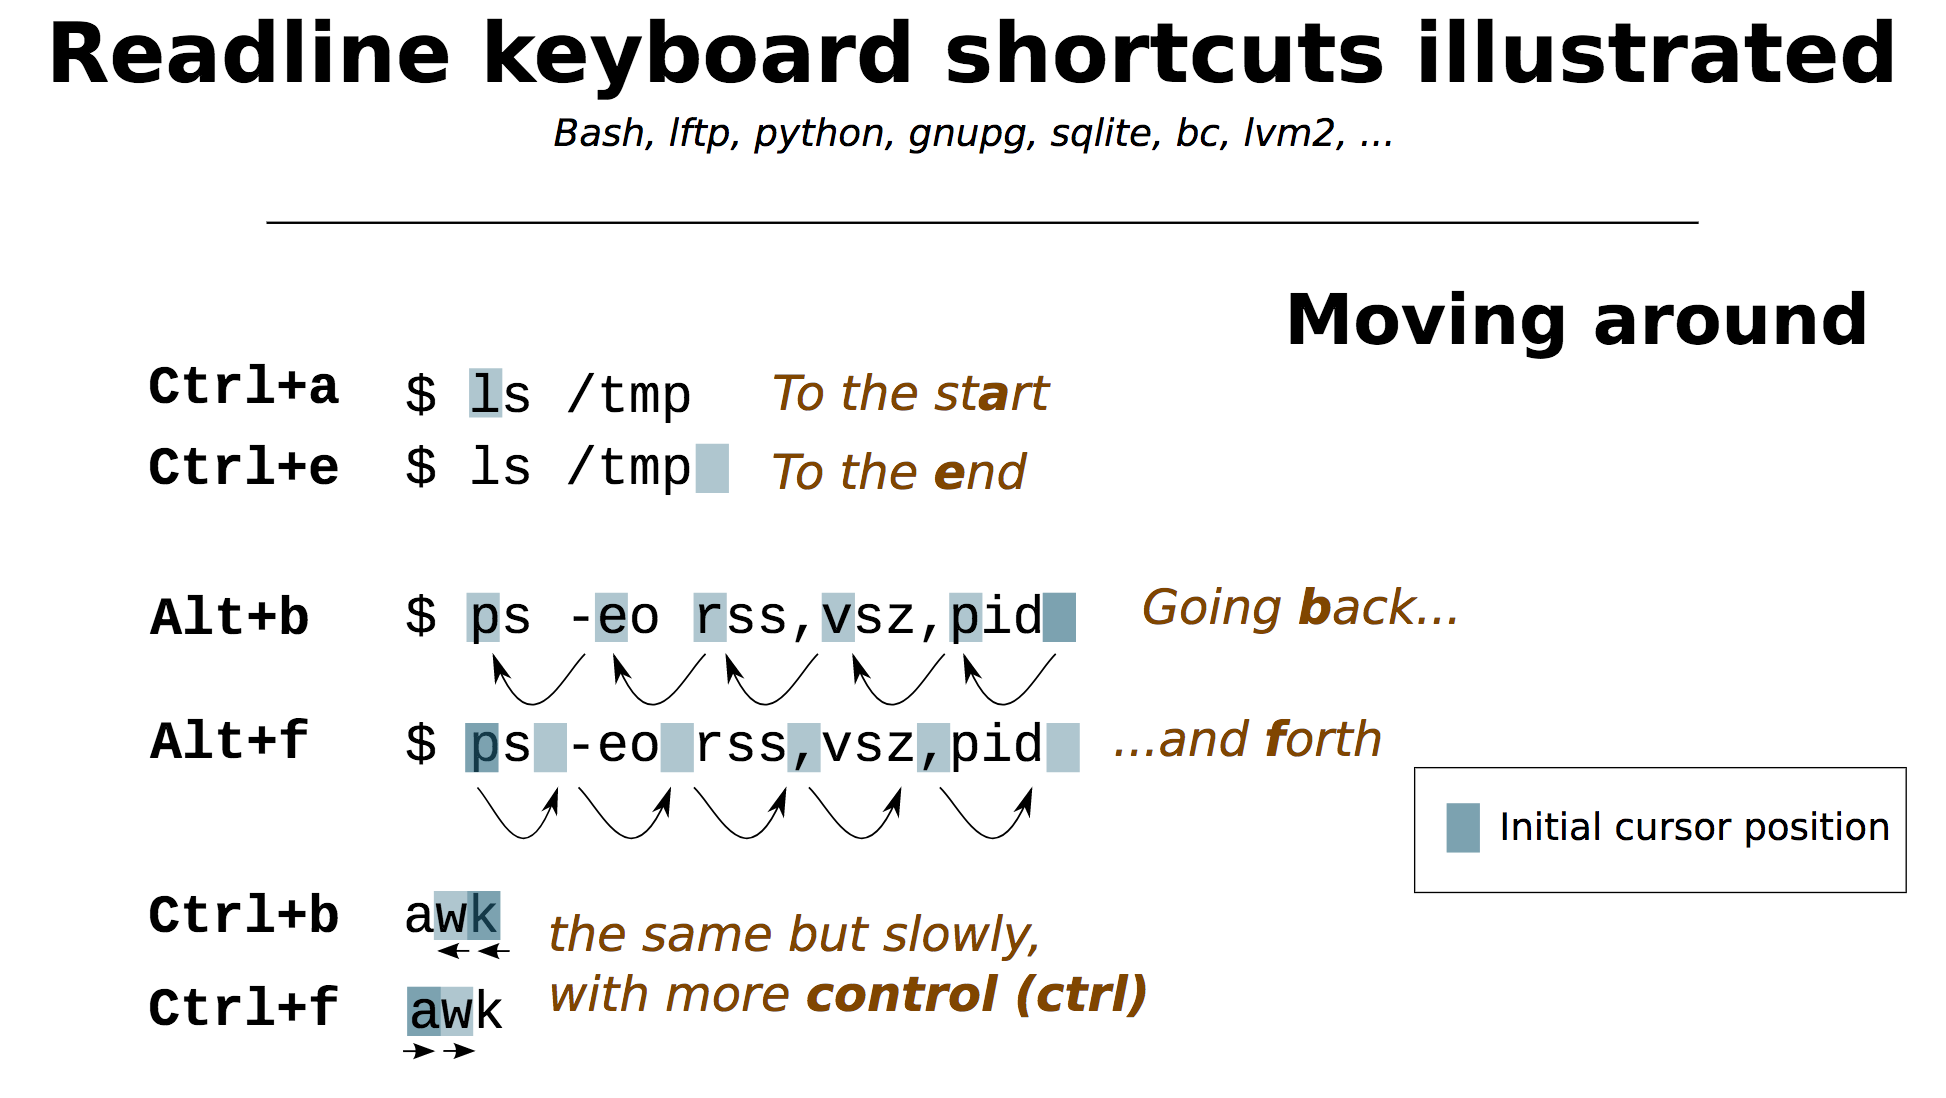 Readline keyboard shortcuts illustrated 671923b01